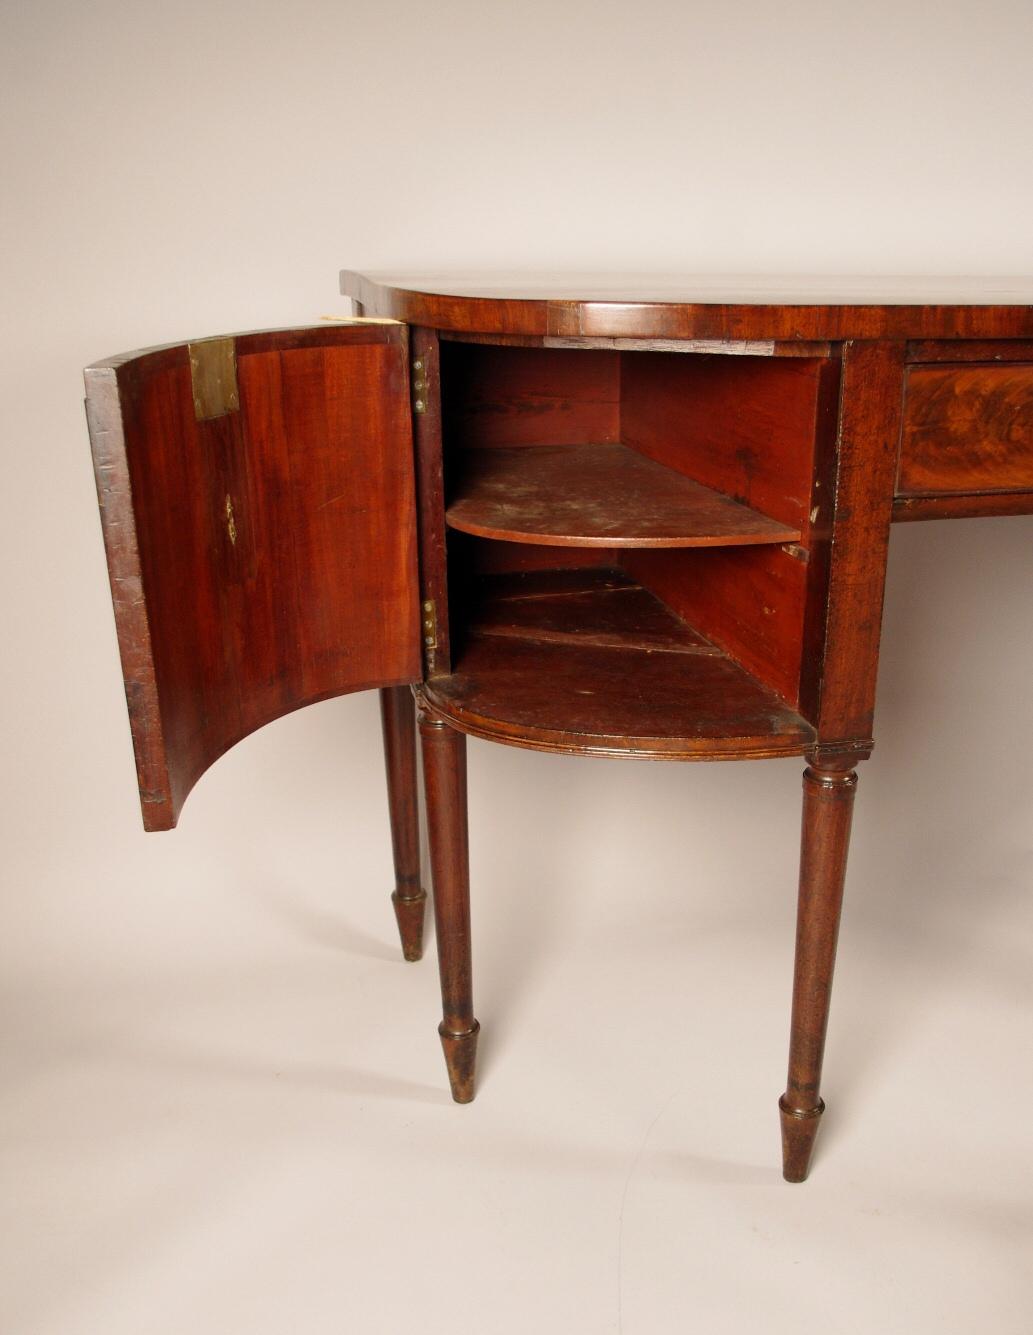 robert morrissey antiques george iii mahogany sideboard. Black Bedroom Furniture Sets. Home Design Ideas